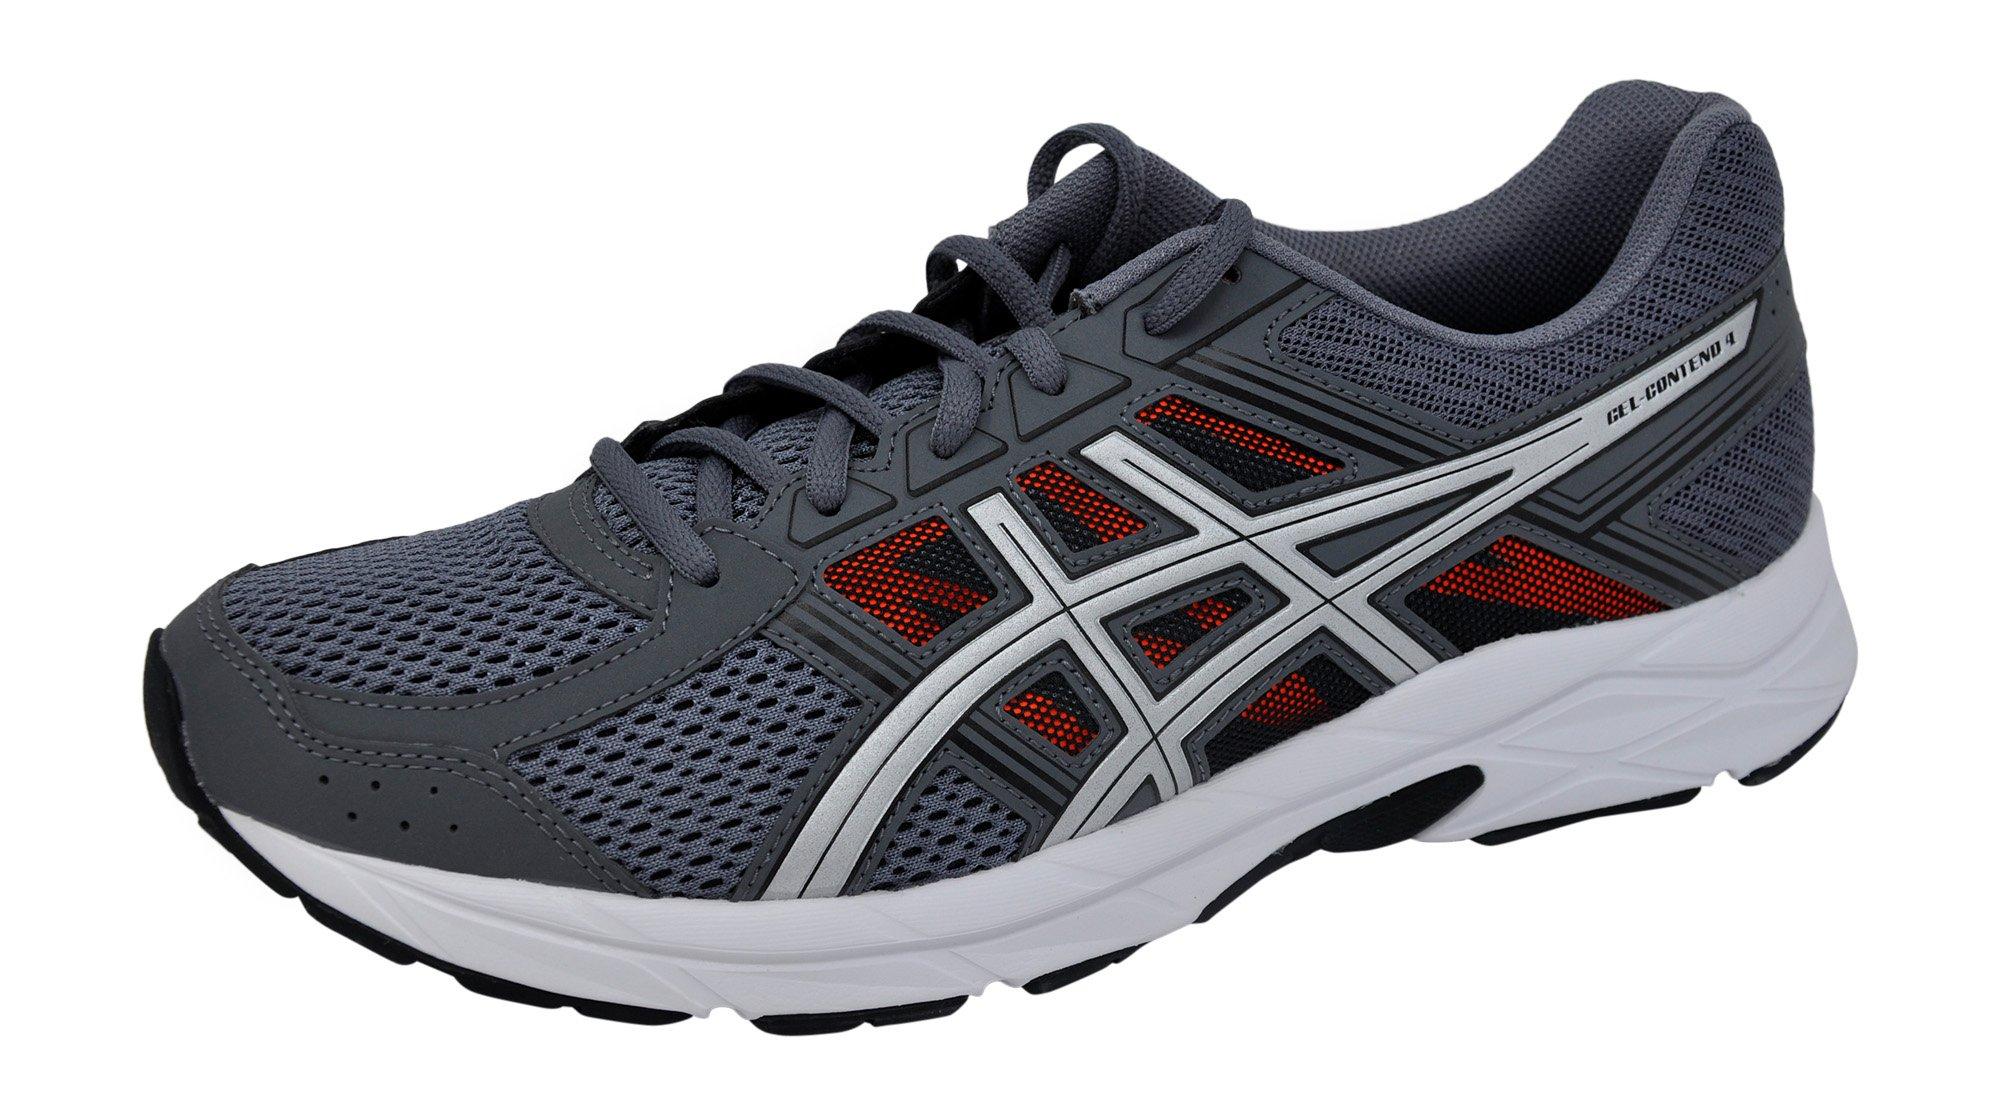 01badbf926e2 Galleon - ASICS Men s Gel-Contend 4 Running Shoe Carbon Silver Orange